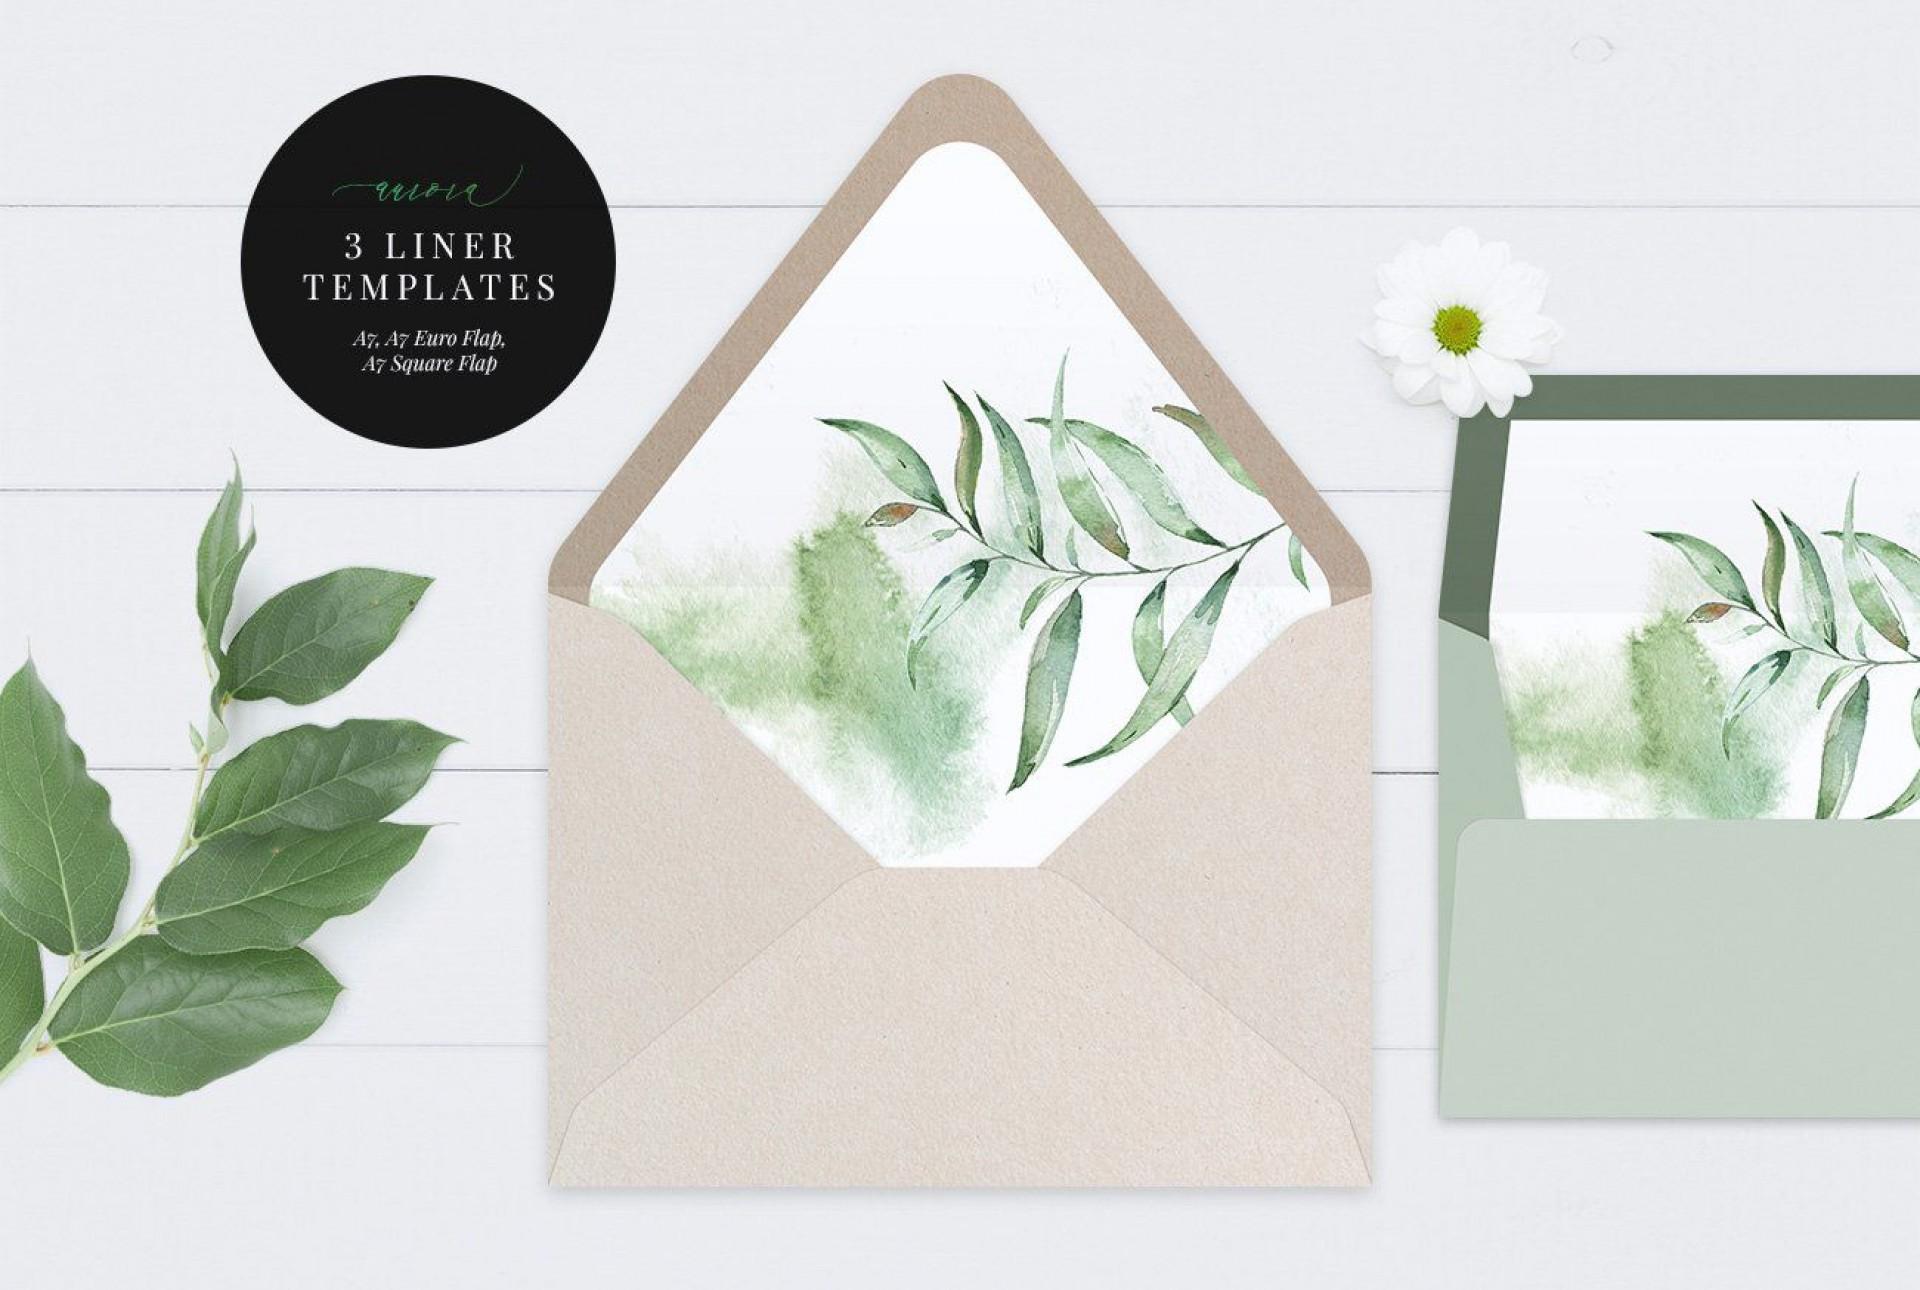 000 Breathtaking A7 Envelope Liner Template Square Flap Idea 1920